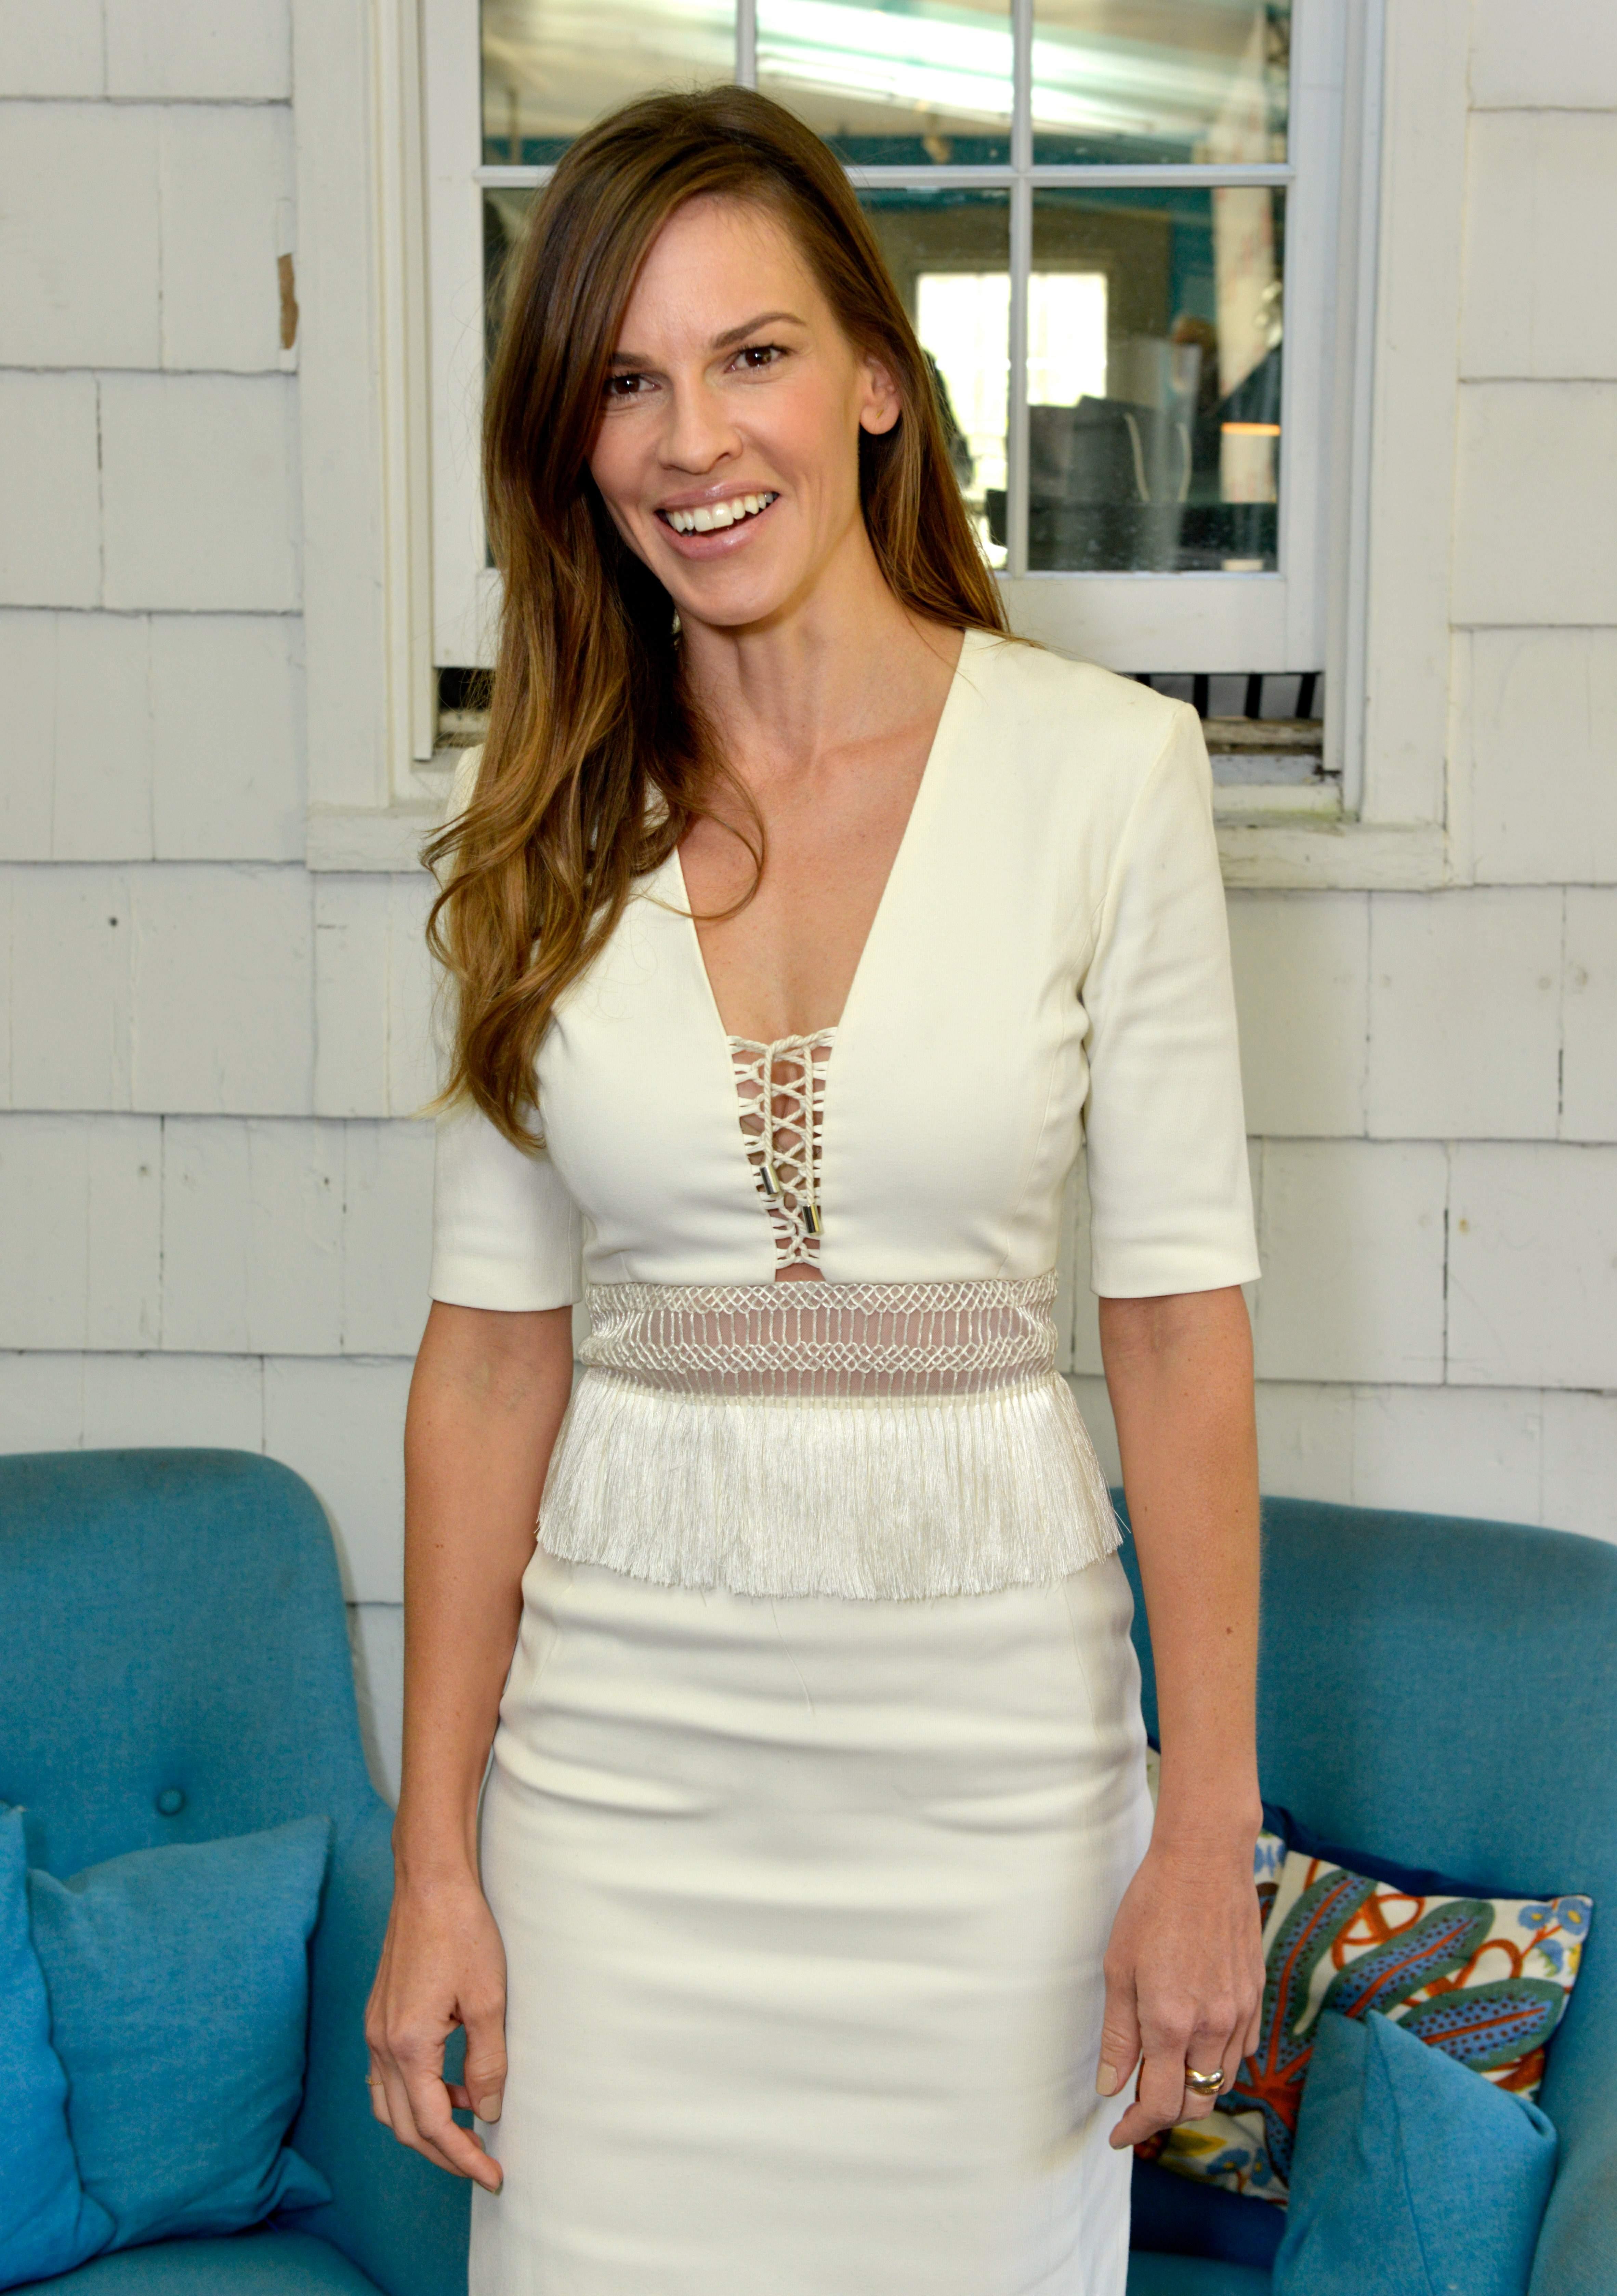 Hilary Swank - Variety's 10 Actors to Watch Brunch in East Hampton 006.jpg